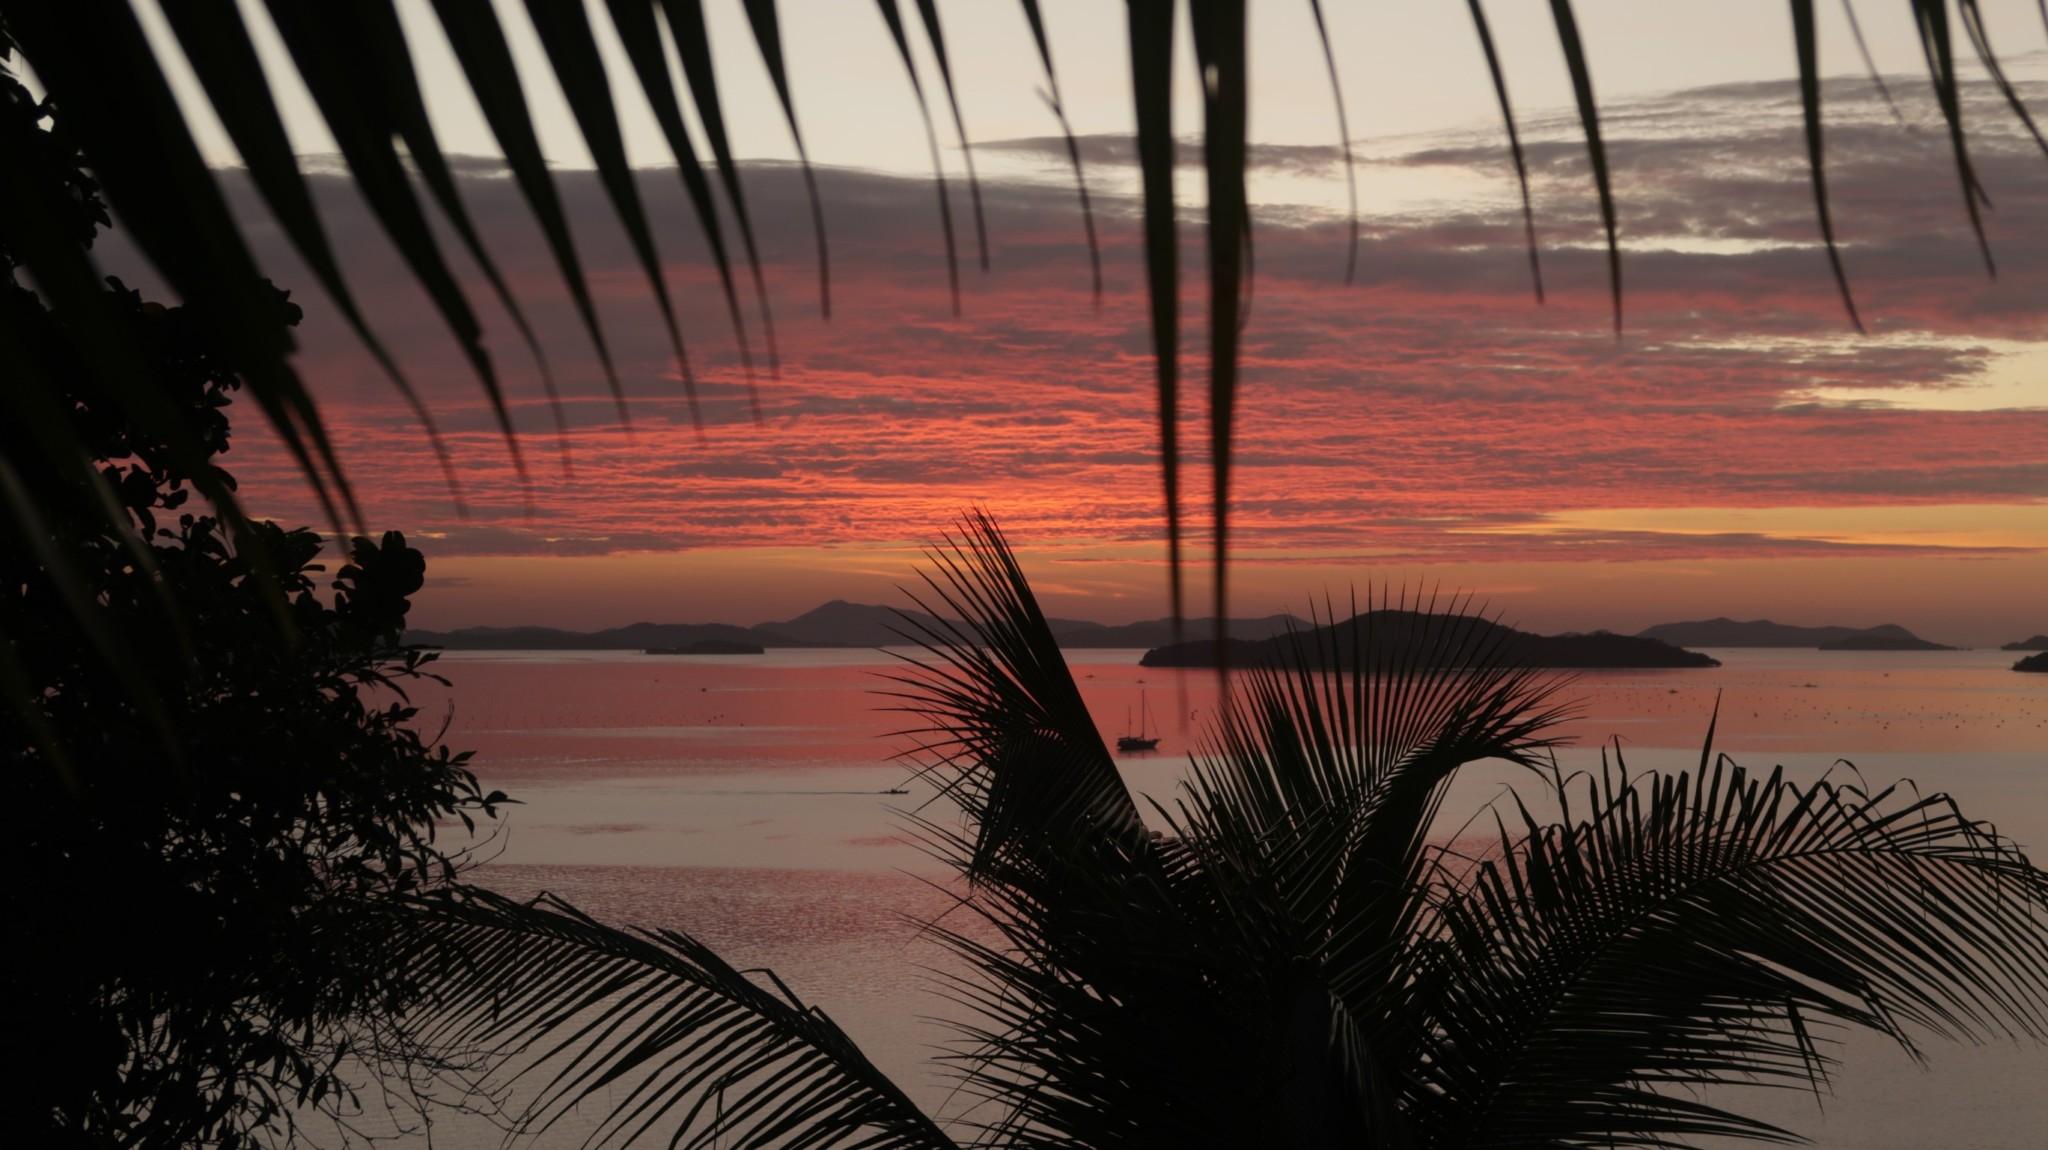 Sunset Palawan